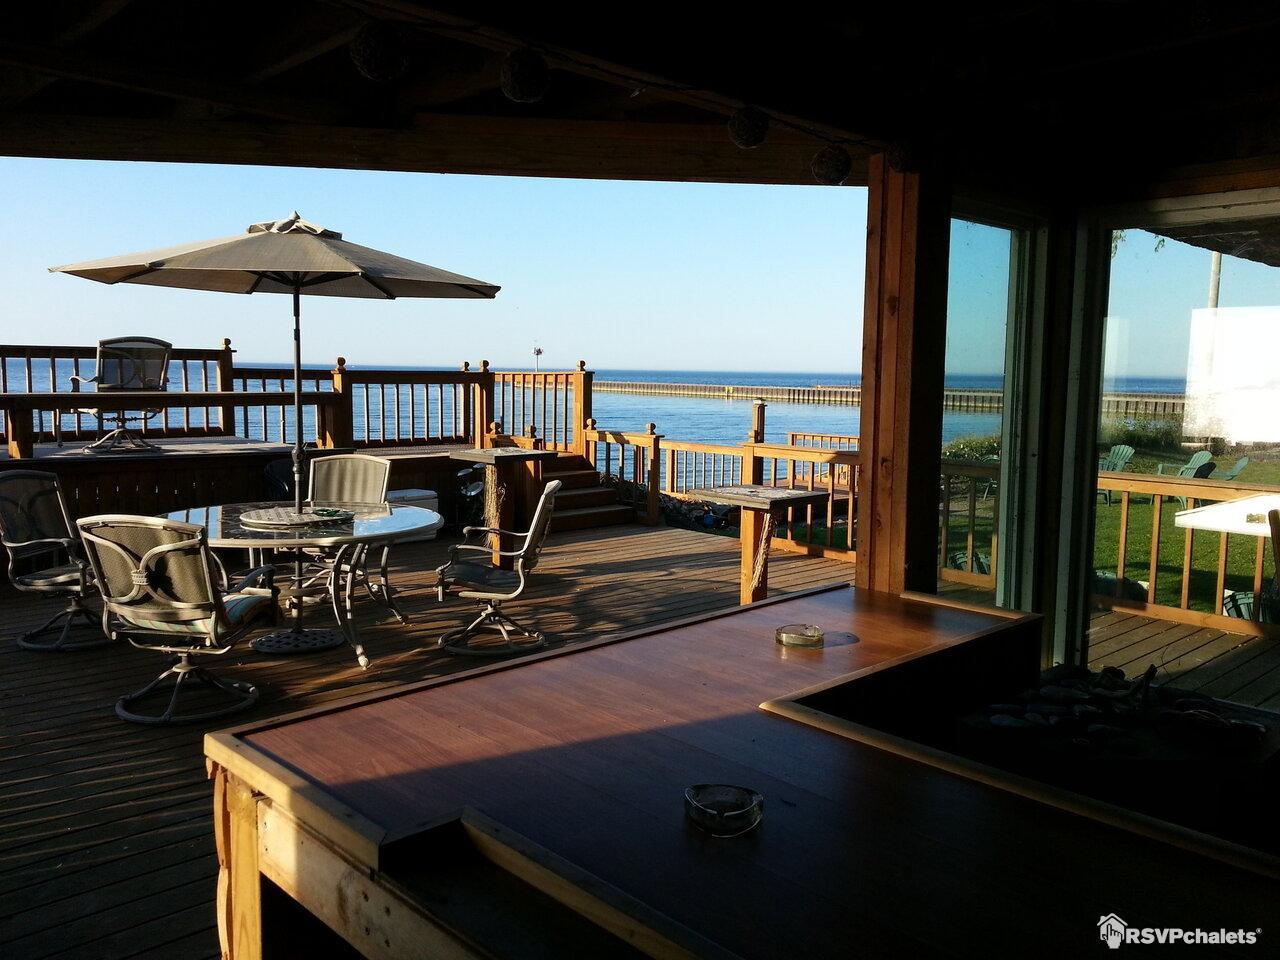 Chalet louer beachfront vacation cottages olcott for Chalet a louer avec piscine intrieure